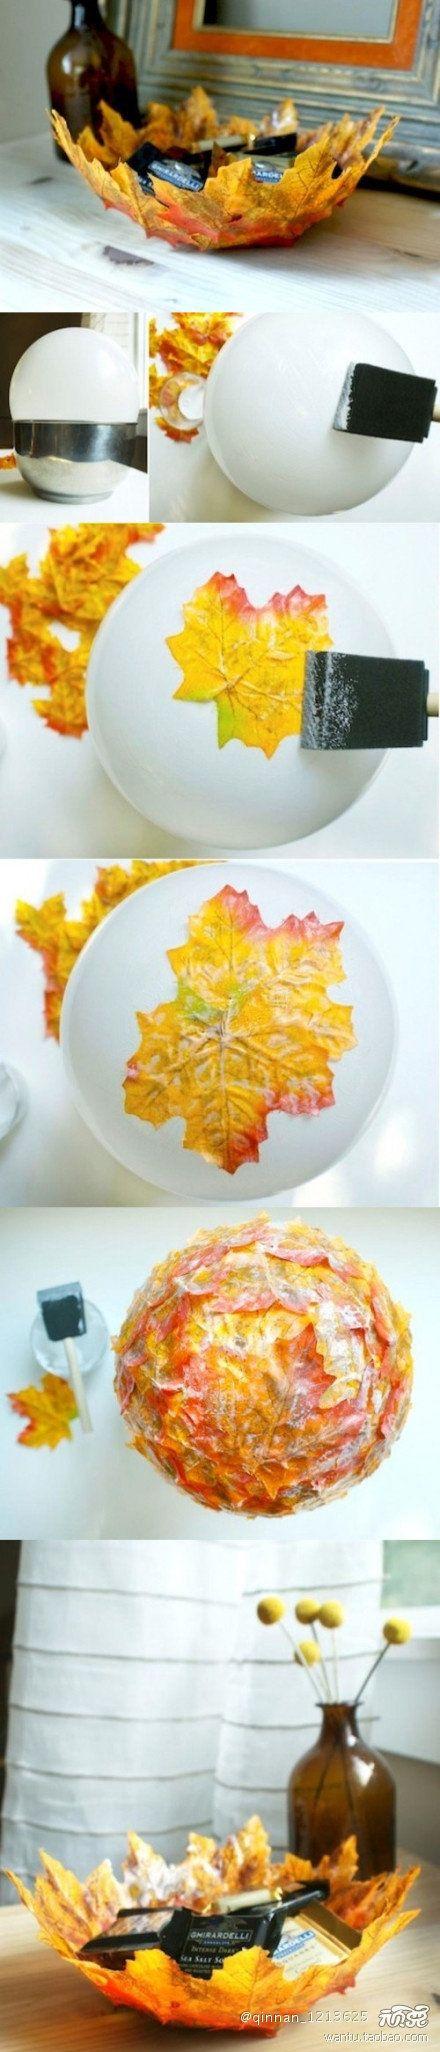 DIY Leaf Bowl DIY Leaf Bowl by diyforever